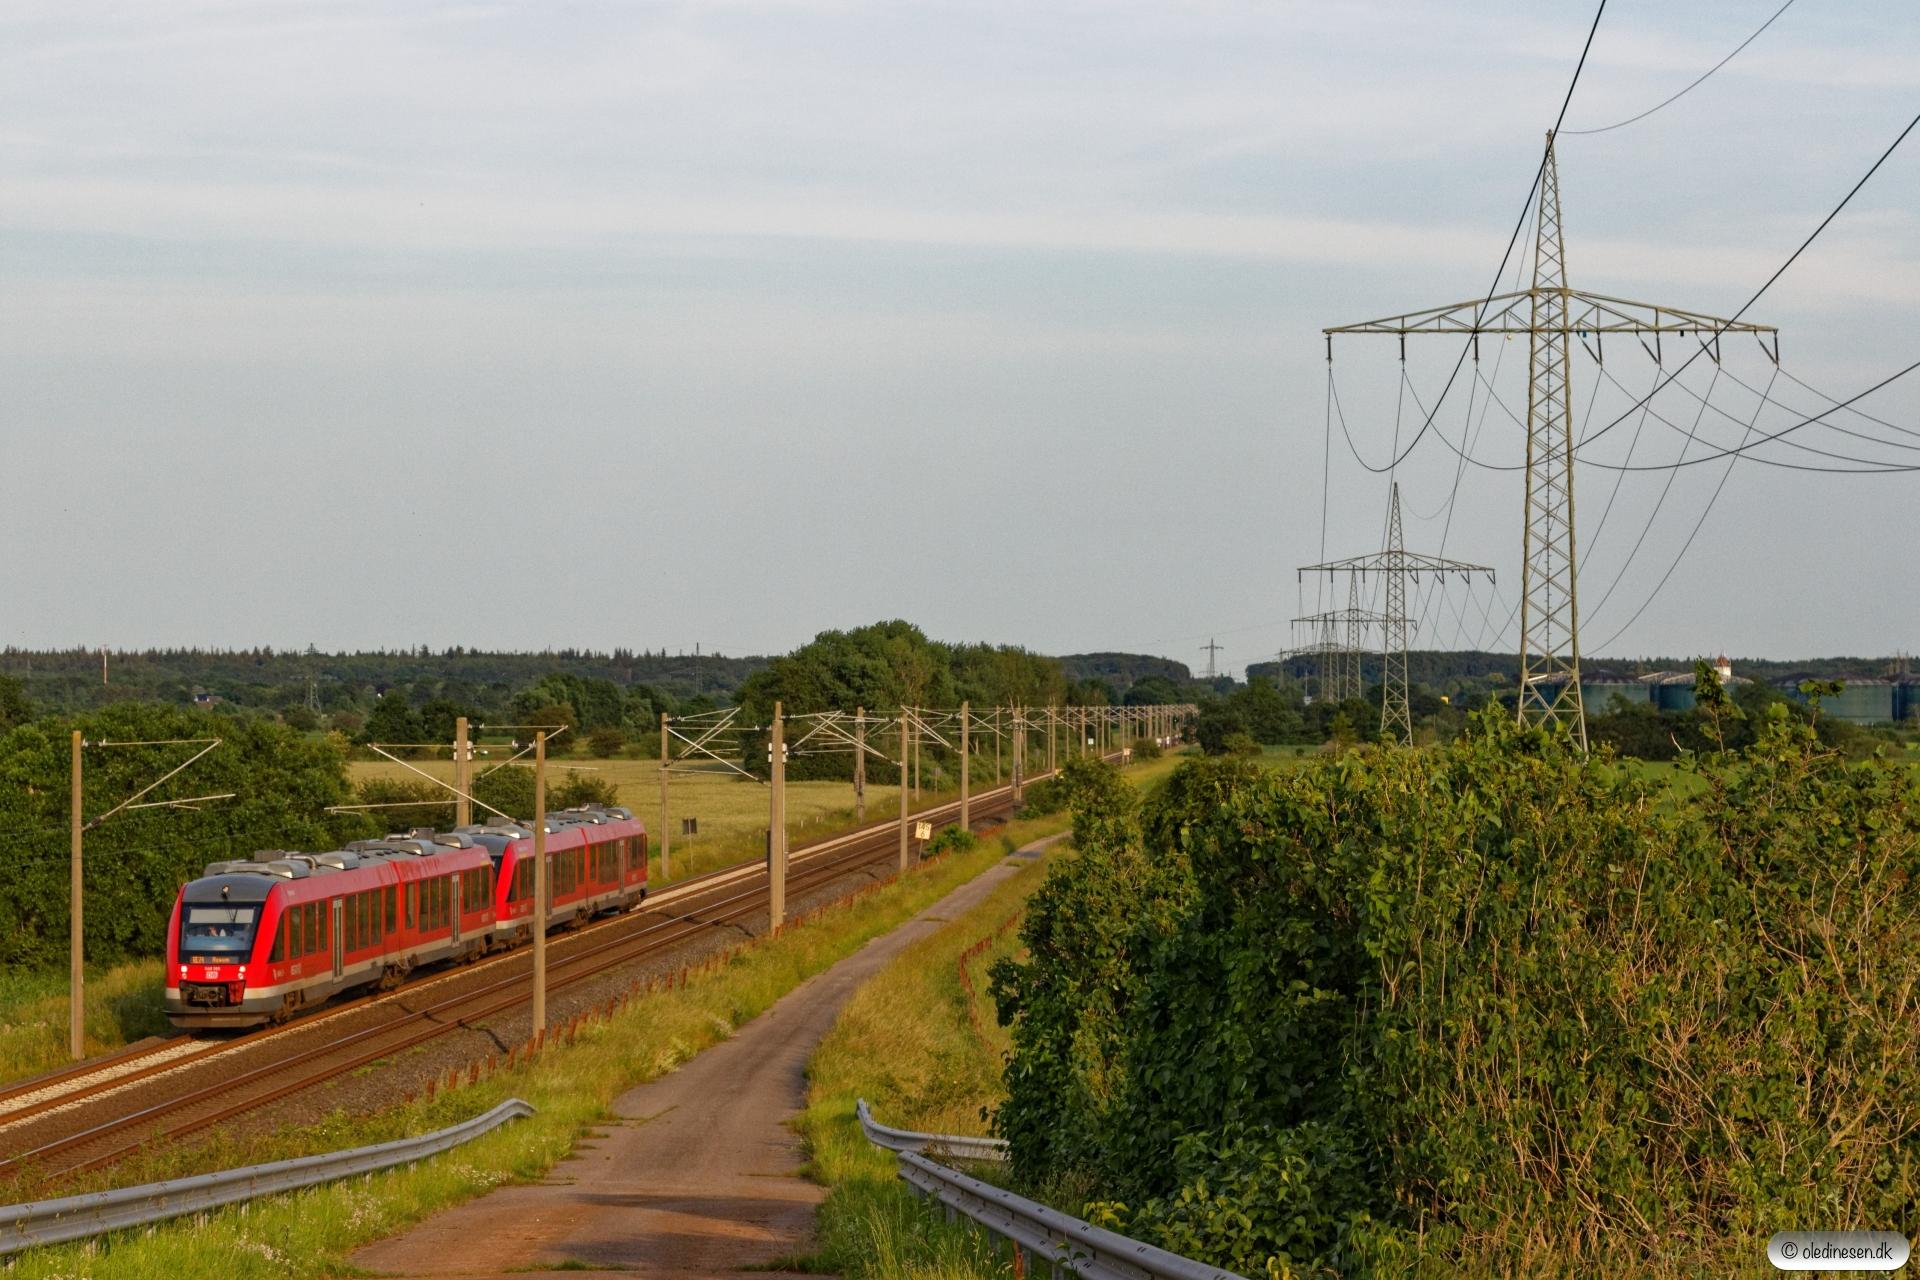 DB 648 355+648 855+648 344+648 844 som RE 21228. Km 145,6 AA (Schuby-Jübek) 23.06.2019.